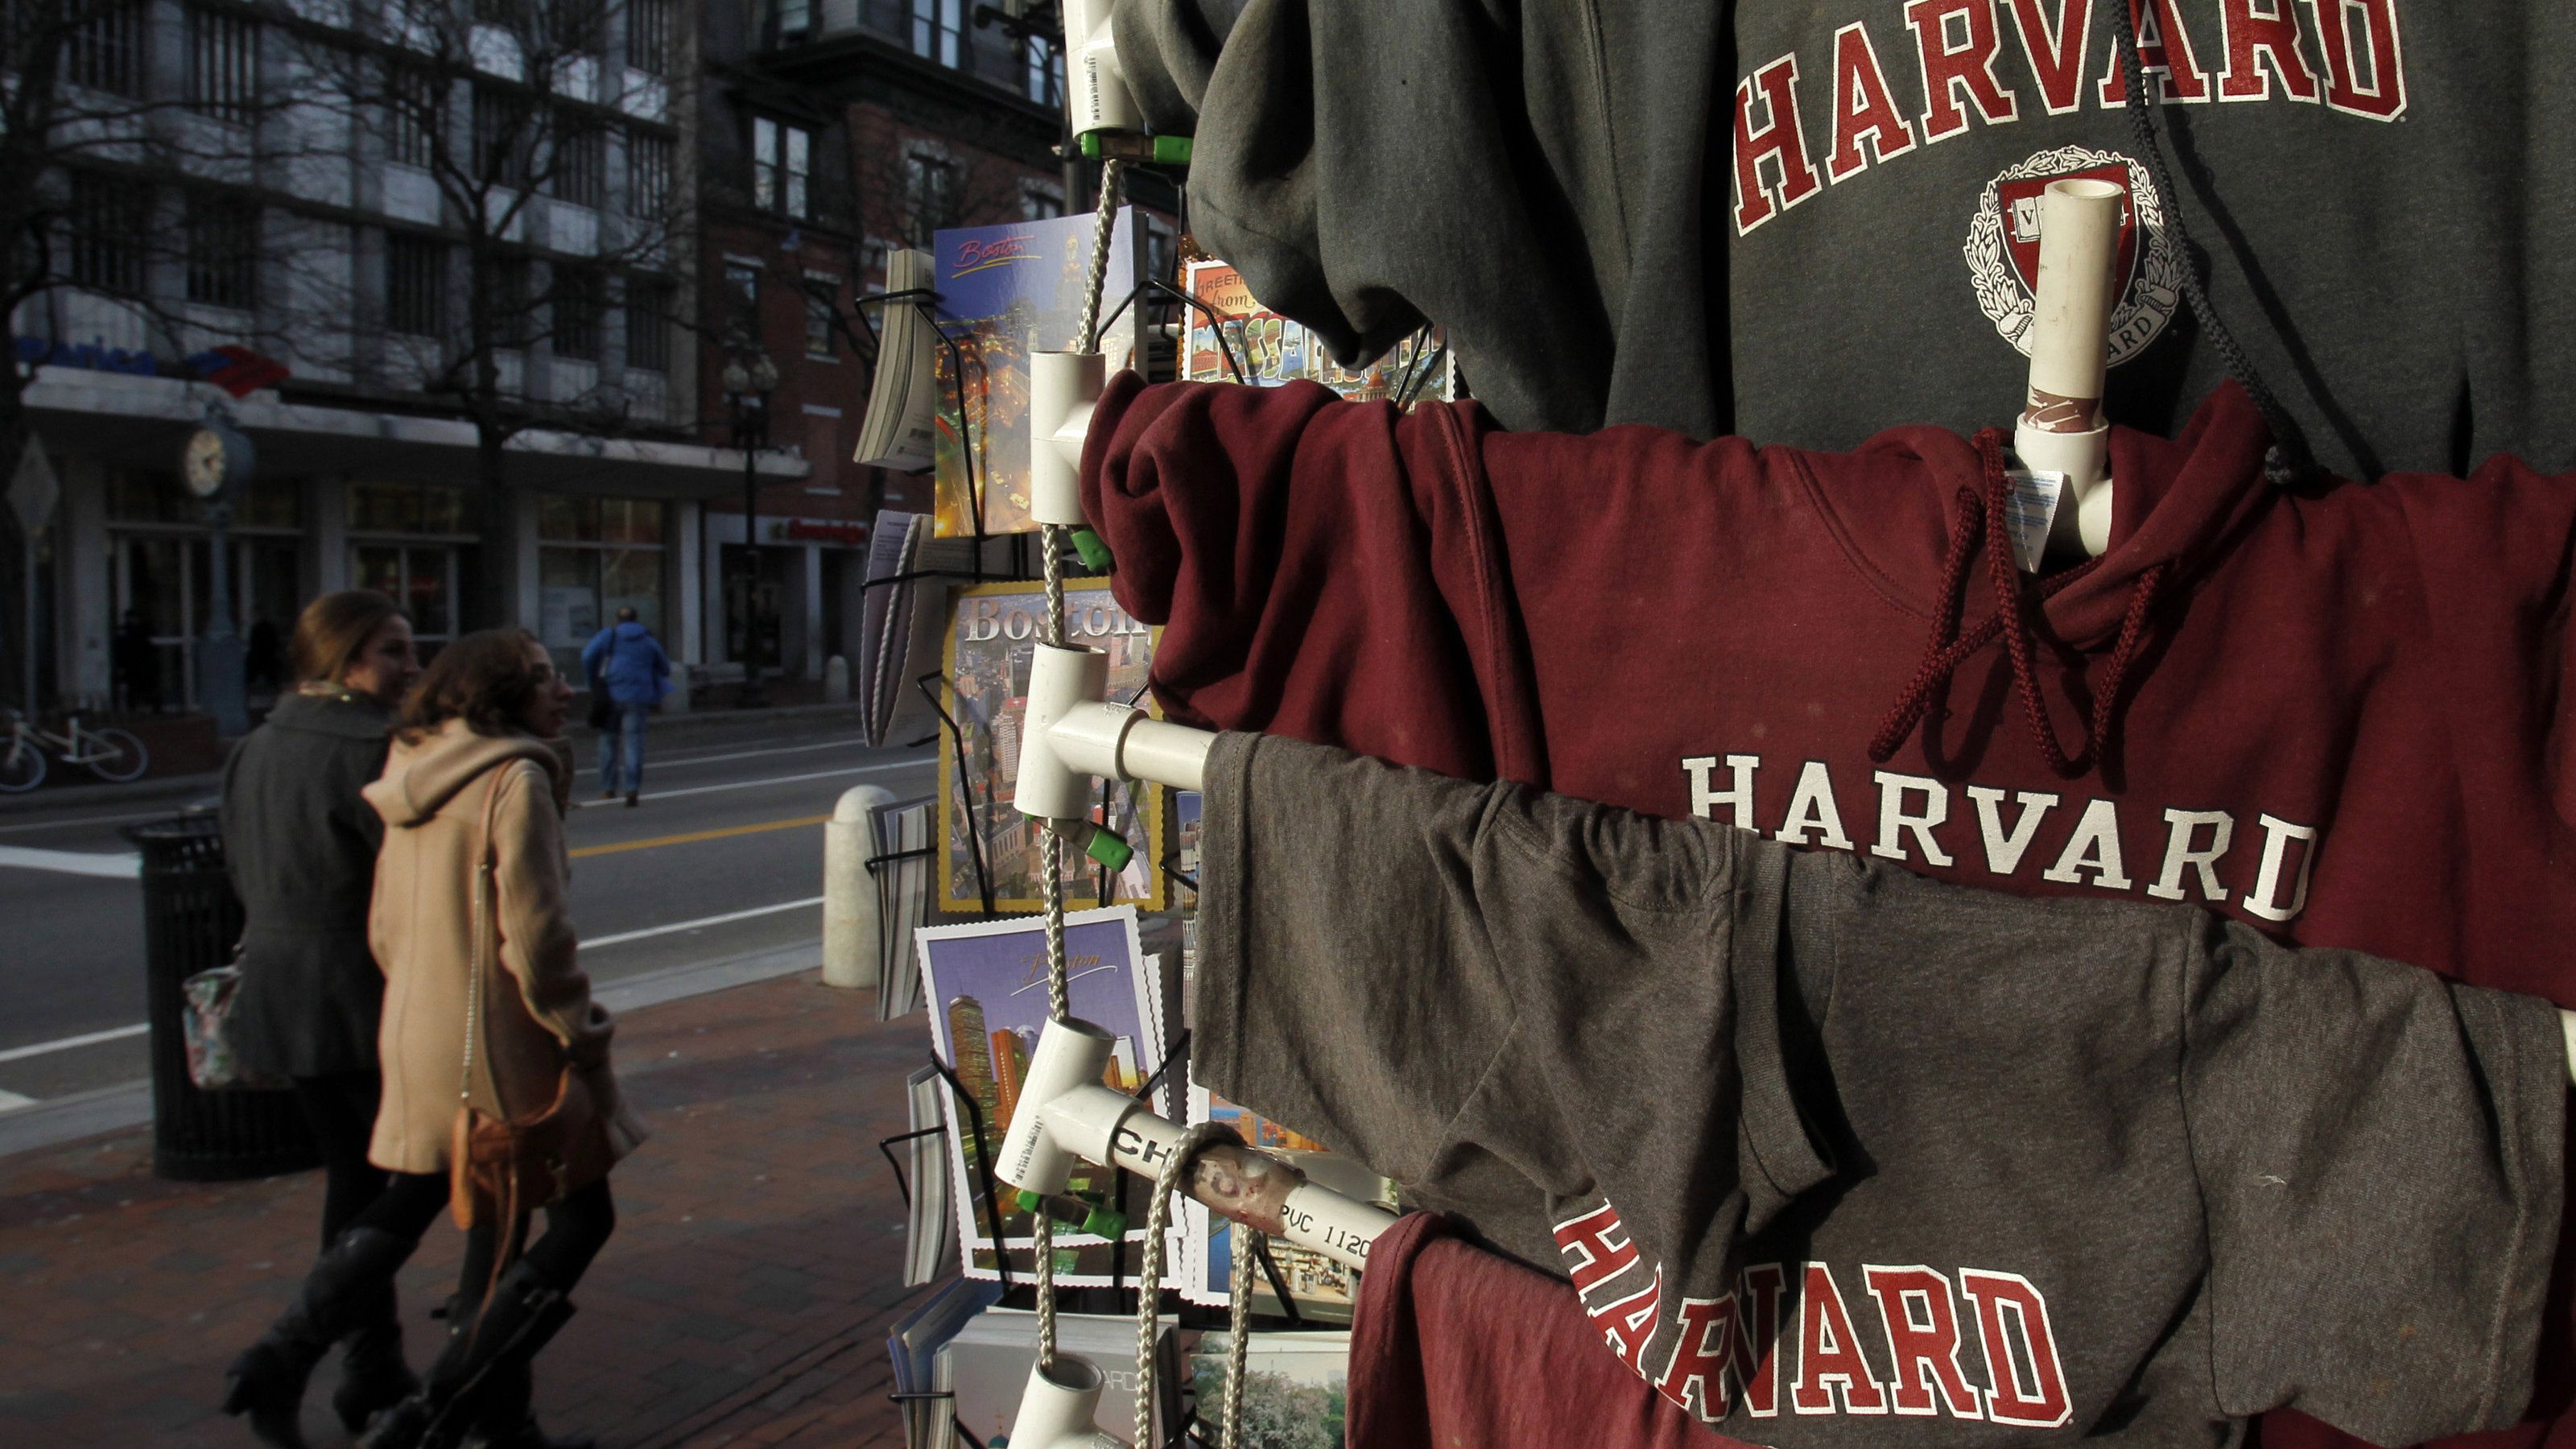 People walk past Harvard University t-shirts for sale in Harvard Square in Cambridge, Massachusetts November 16, 2012.